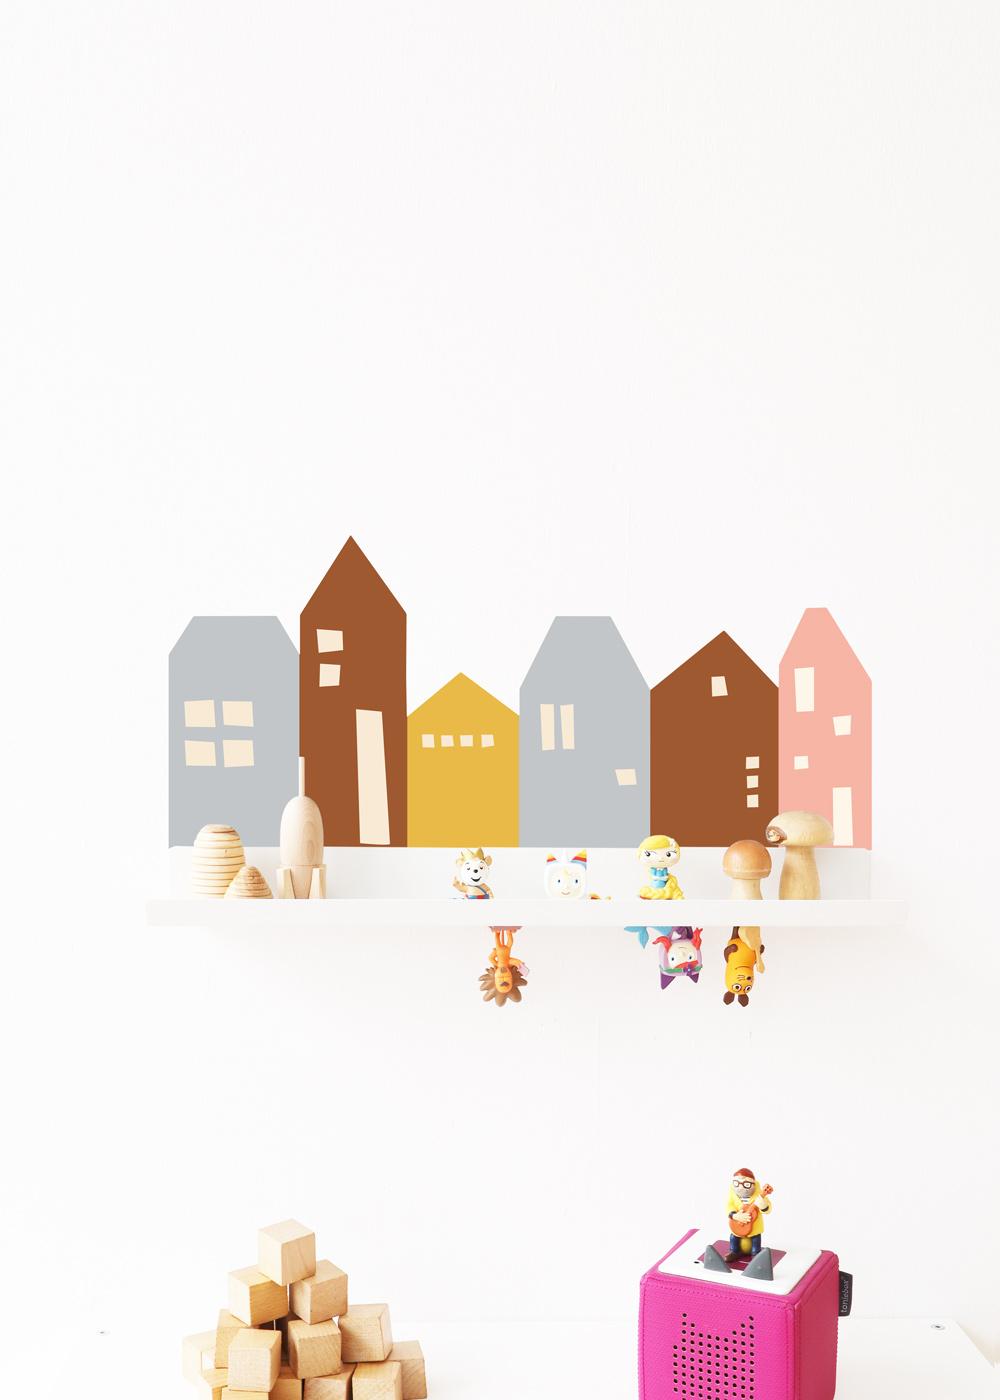 Ikea Malmbäck Bilderleiste Lille Hus Eisblau Camel Gesamtansicht